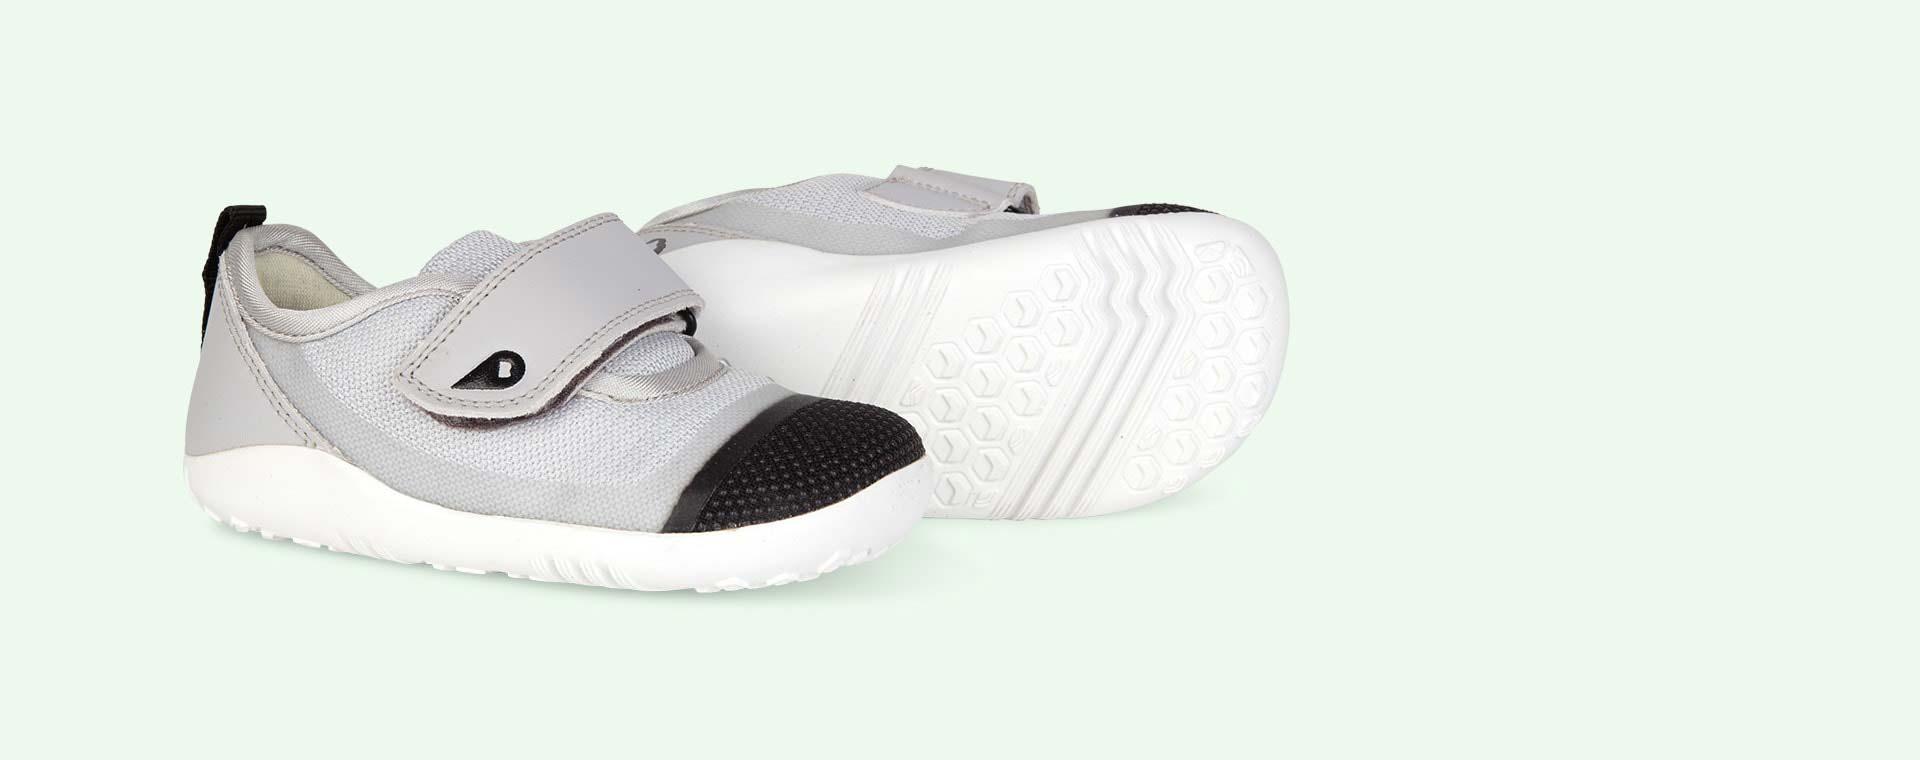 Grey Bobux I-Walk Lo Dimension Shoe